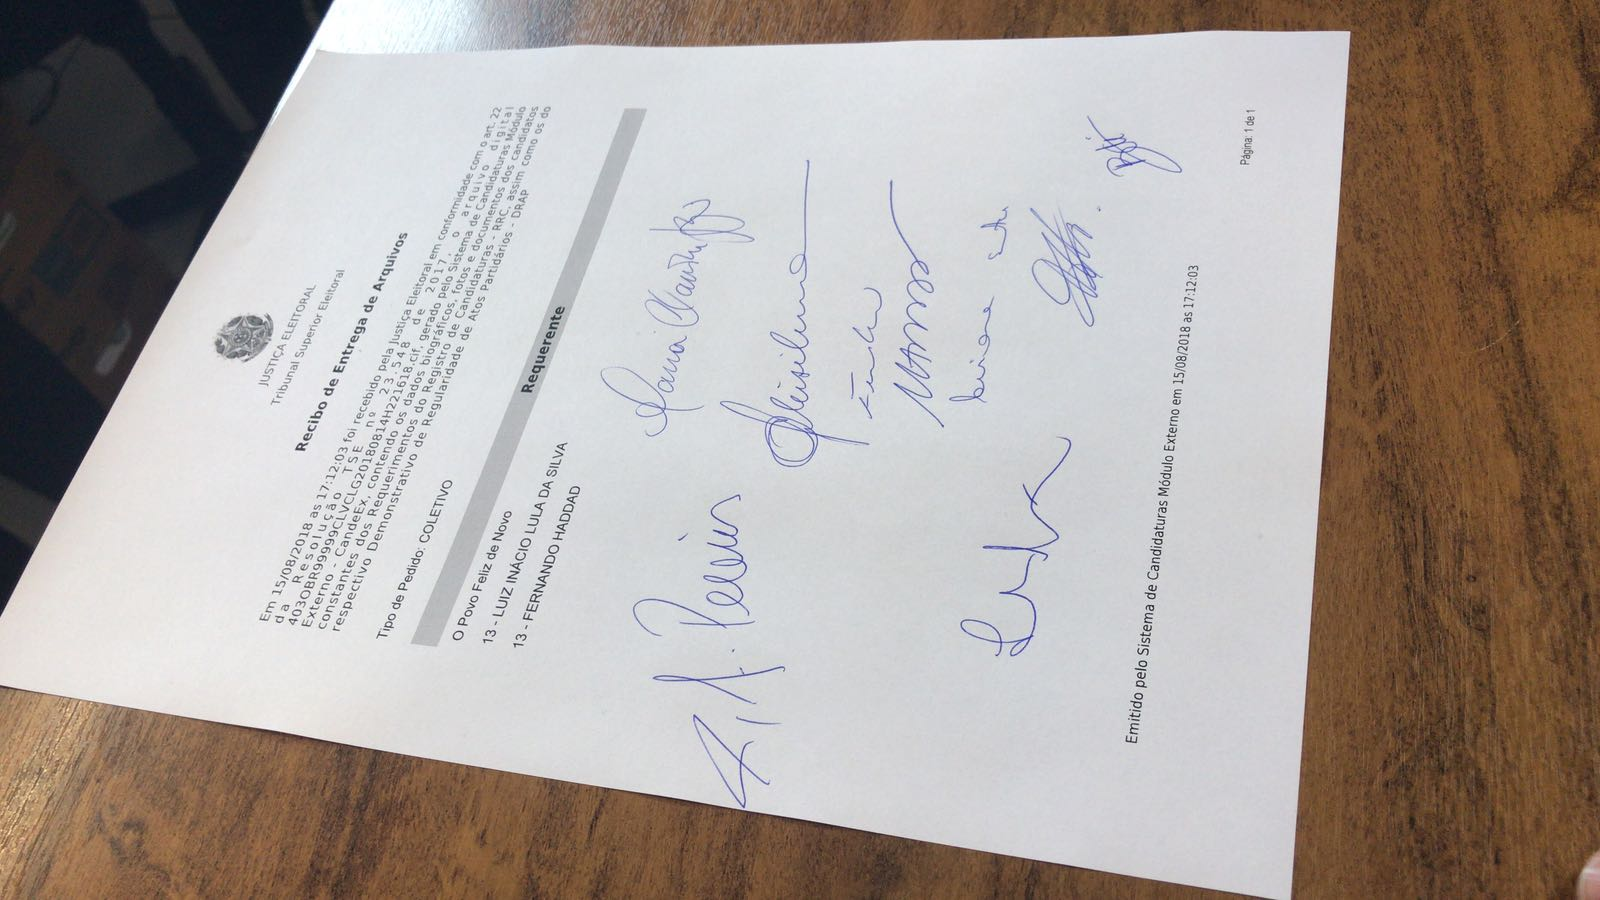 É oficial! #LulaÉCandidato Acompanhe em https://t.co/GP2HjC4ypa https://t.co/2BsxC0NiD6